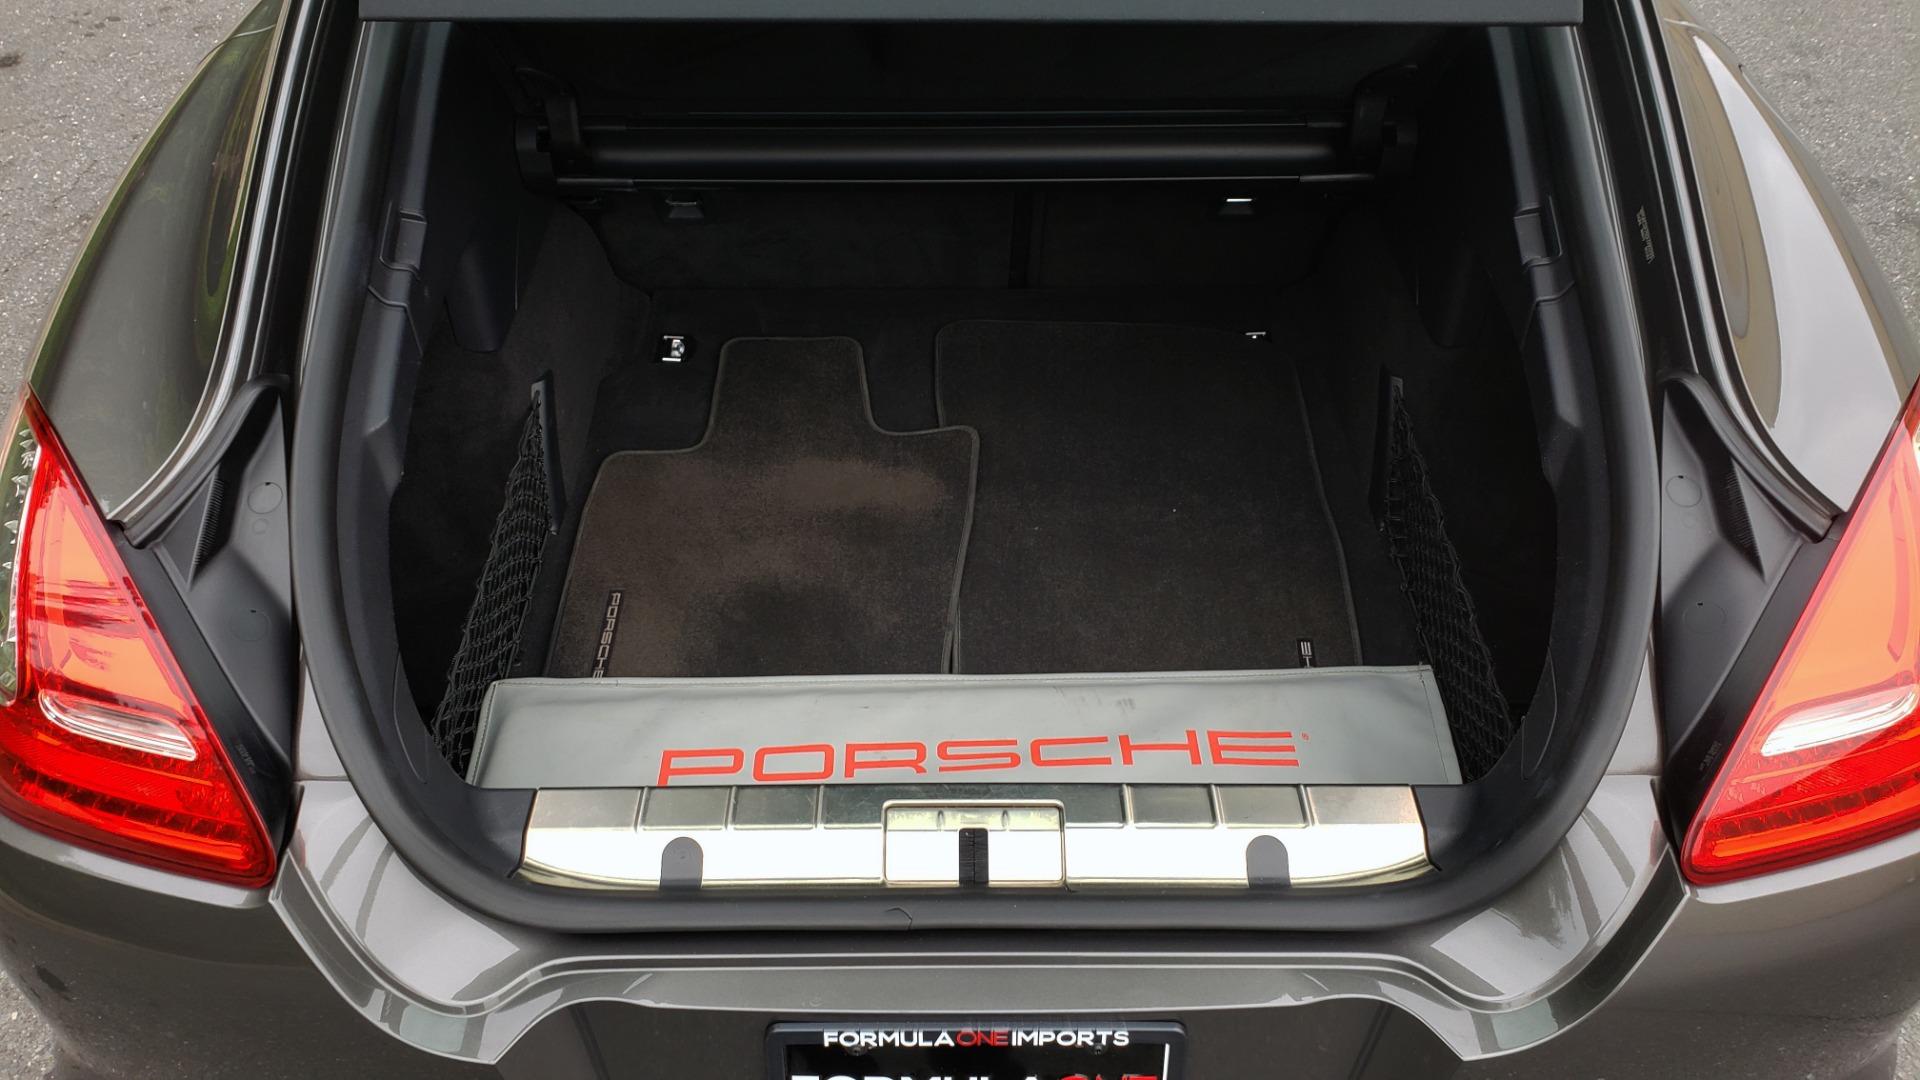 Used 2013 Porsche PANAMERA TURBO 4.8L V8 / AWD / NAV / SUNROOF / LCA / PARK ASST / BURMESTER for sale $45,995 at Formula Imports in Charlotte NC 28227 15